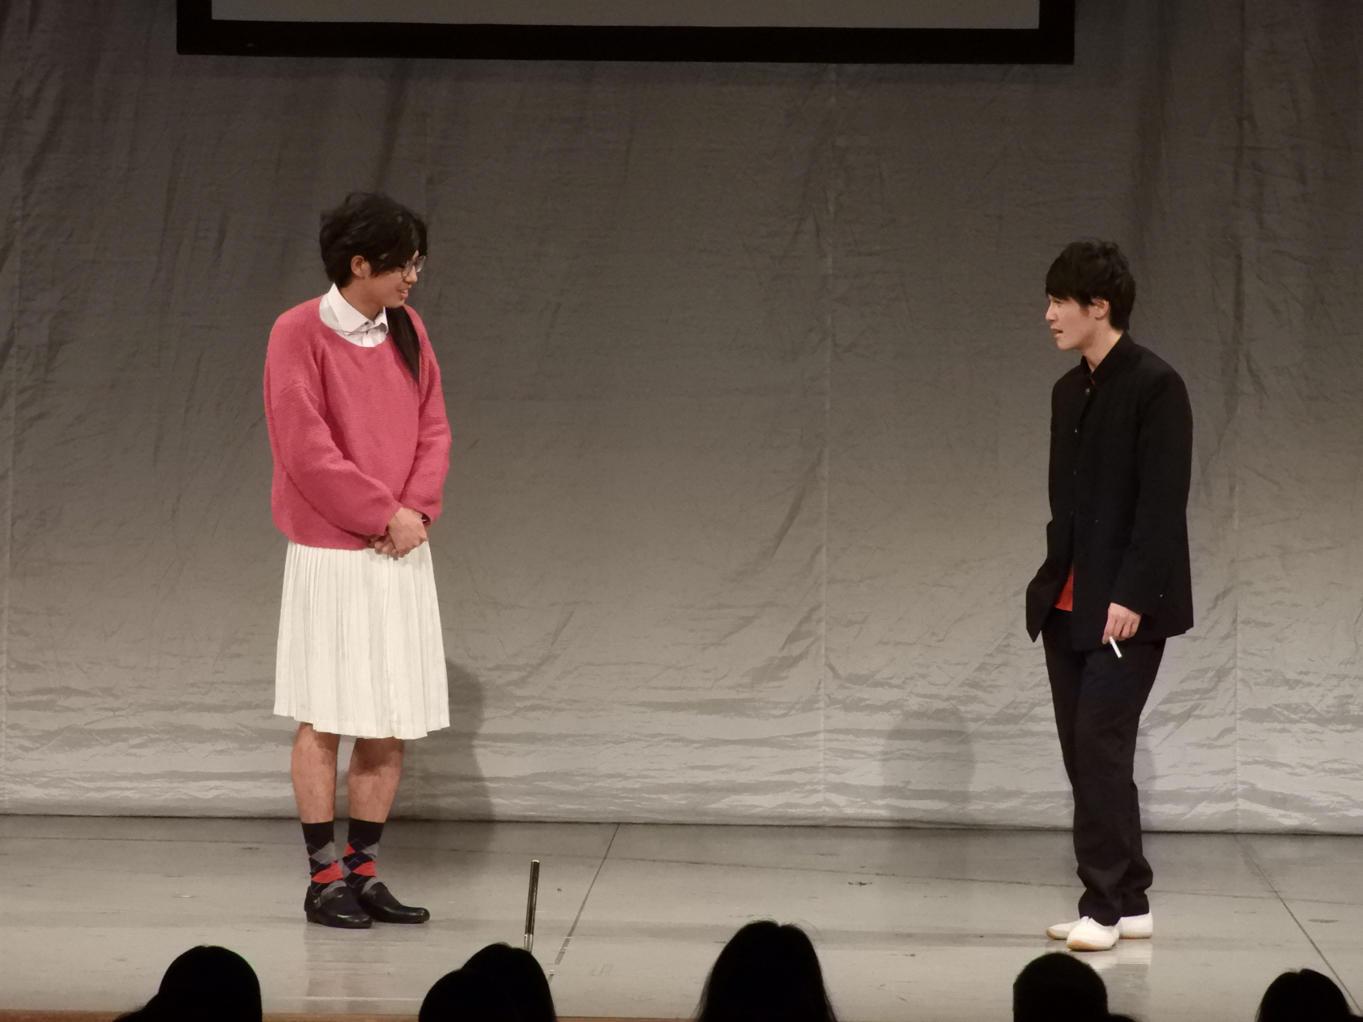 http://news.yoshimoto.co.jp/20180204153235-77b124b8c481eb3bee49d0ebef540173bc967745.jpg